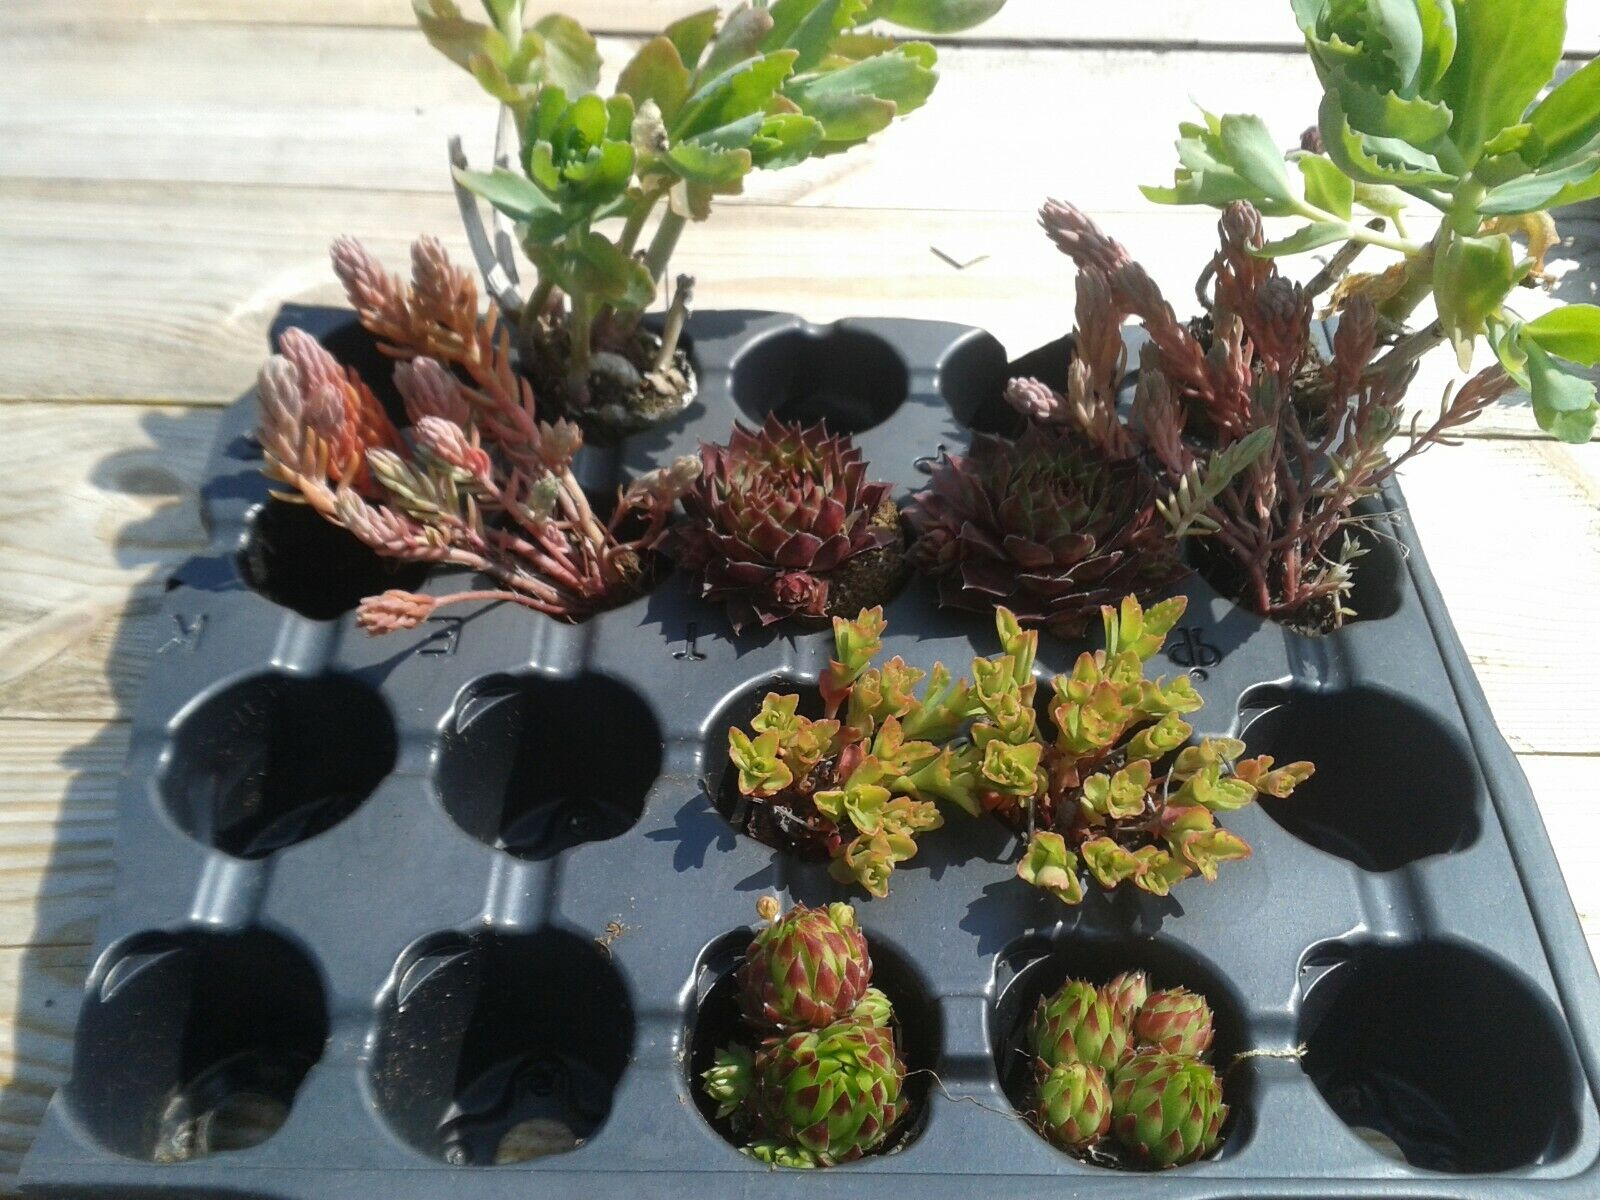 Dachbegrünung Sedumpflanzen Dachgrün Pflanzen Dachabdichtung Flachdach Carport